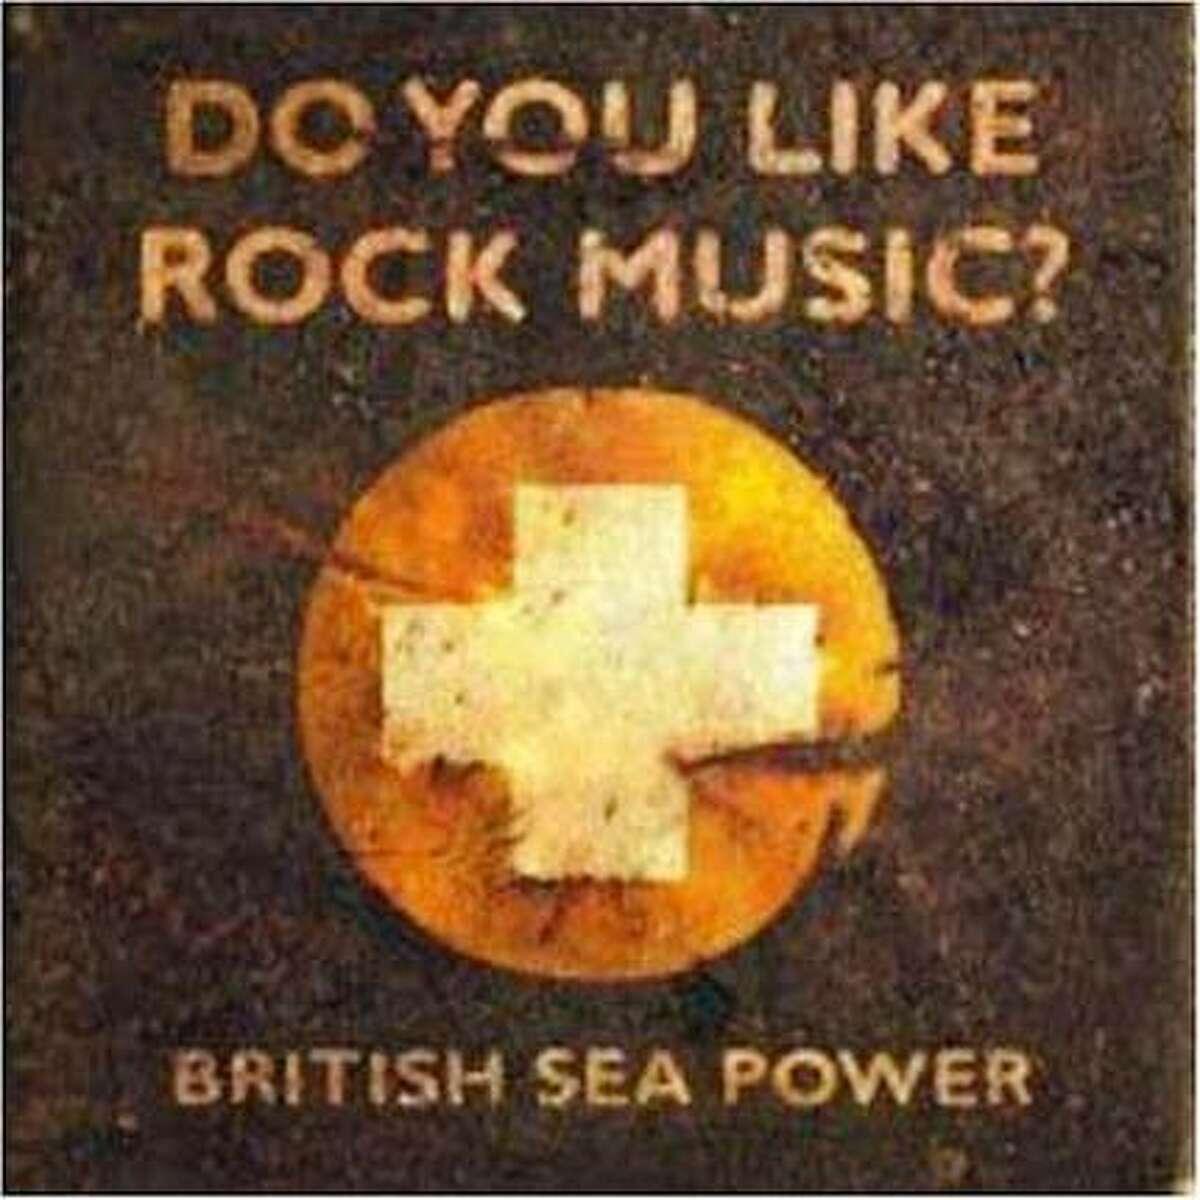 British Sea Power: